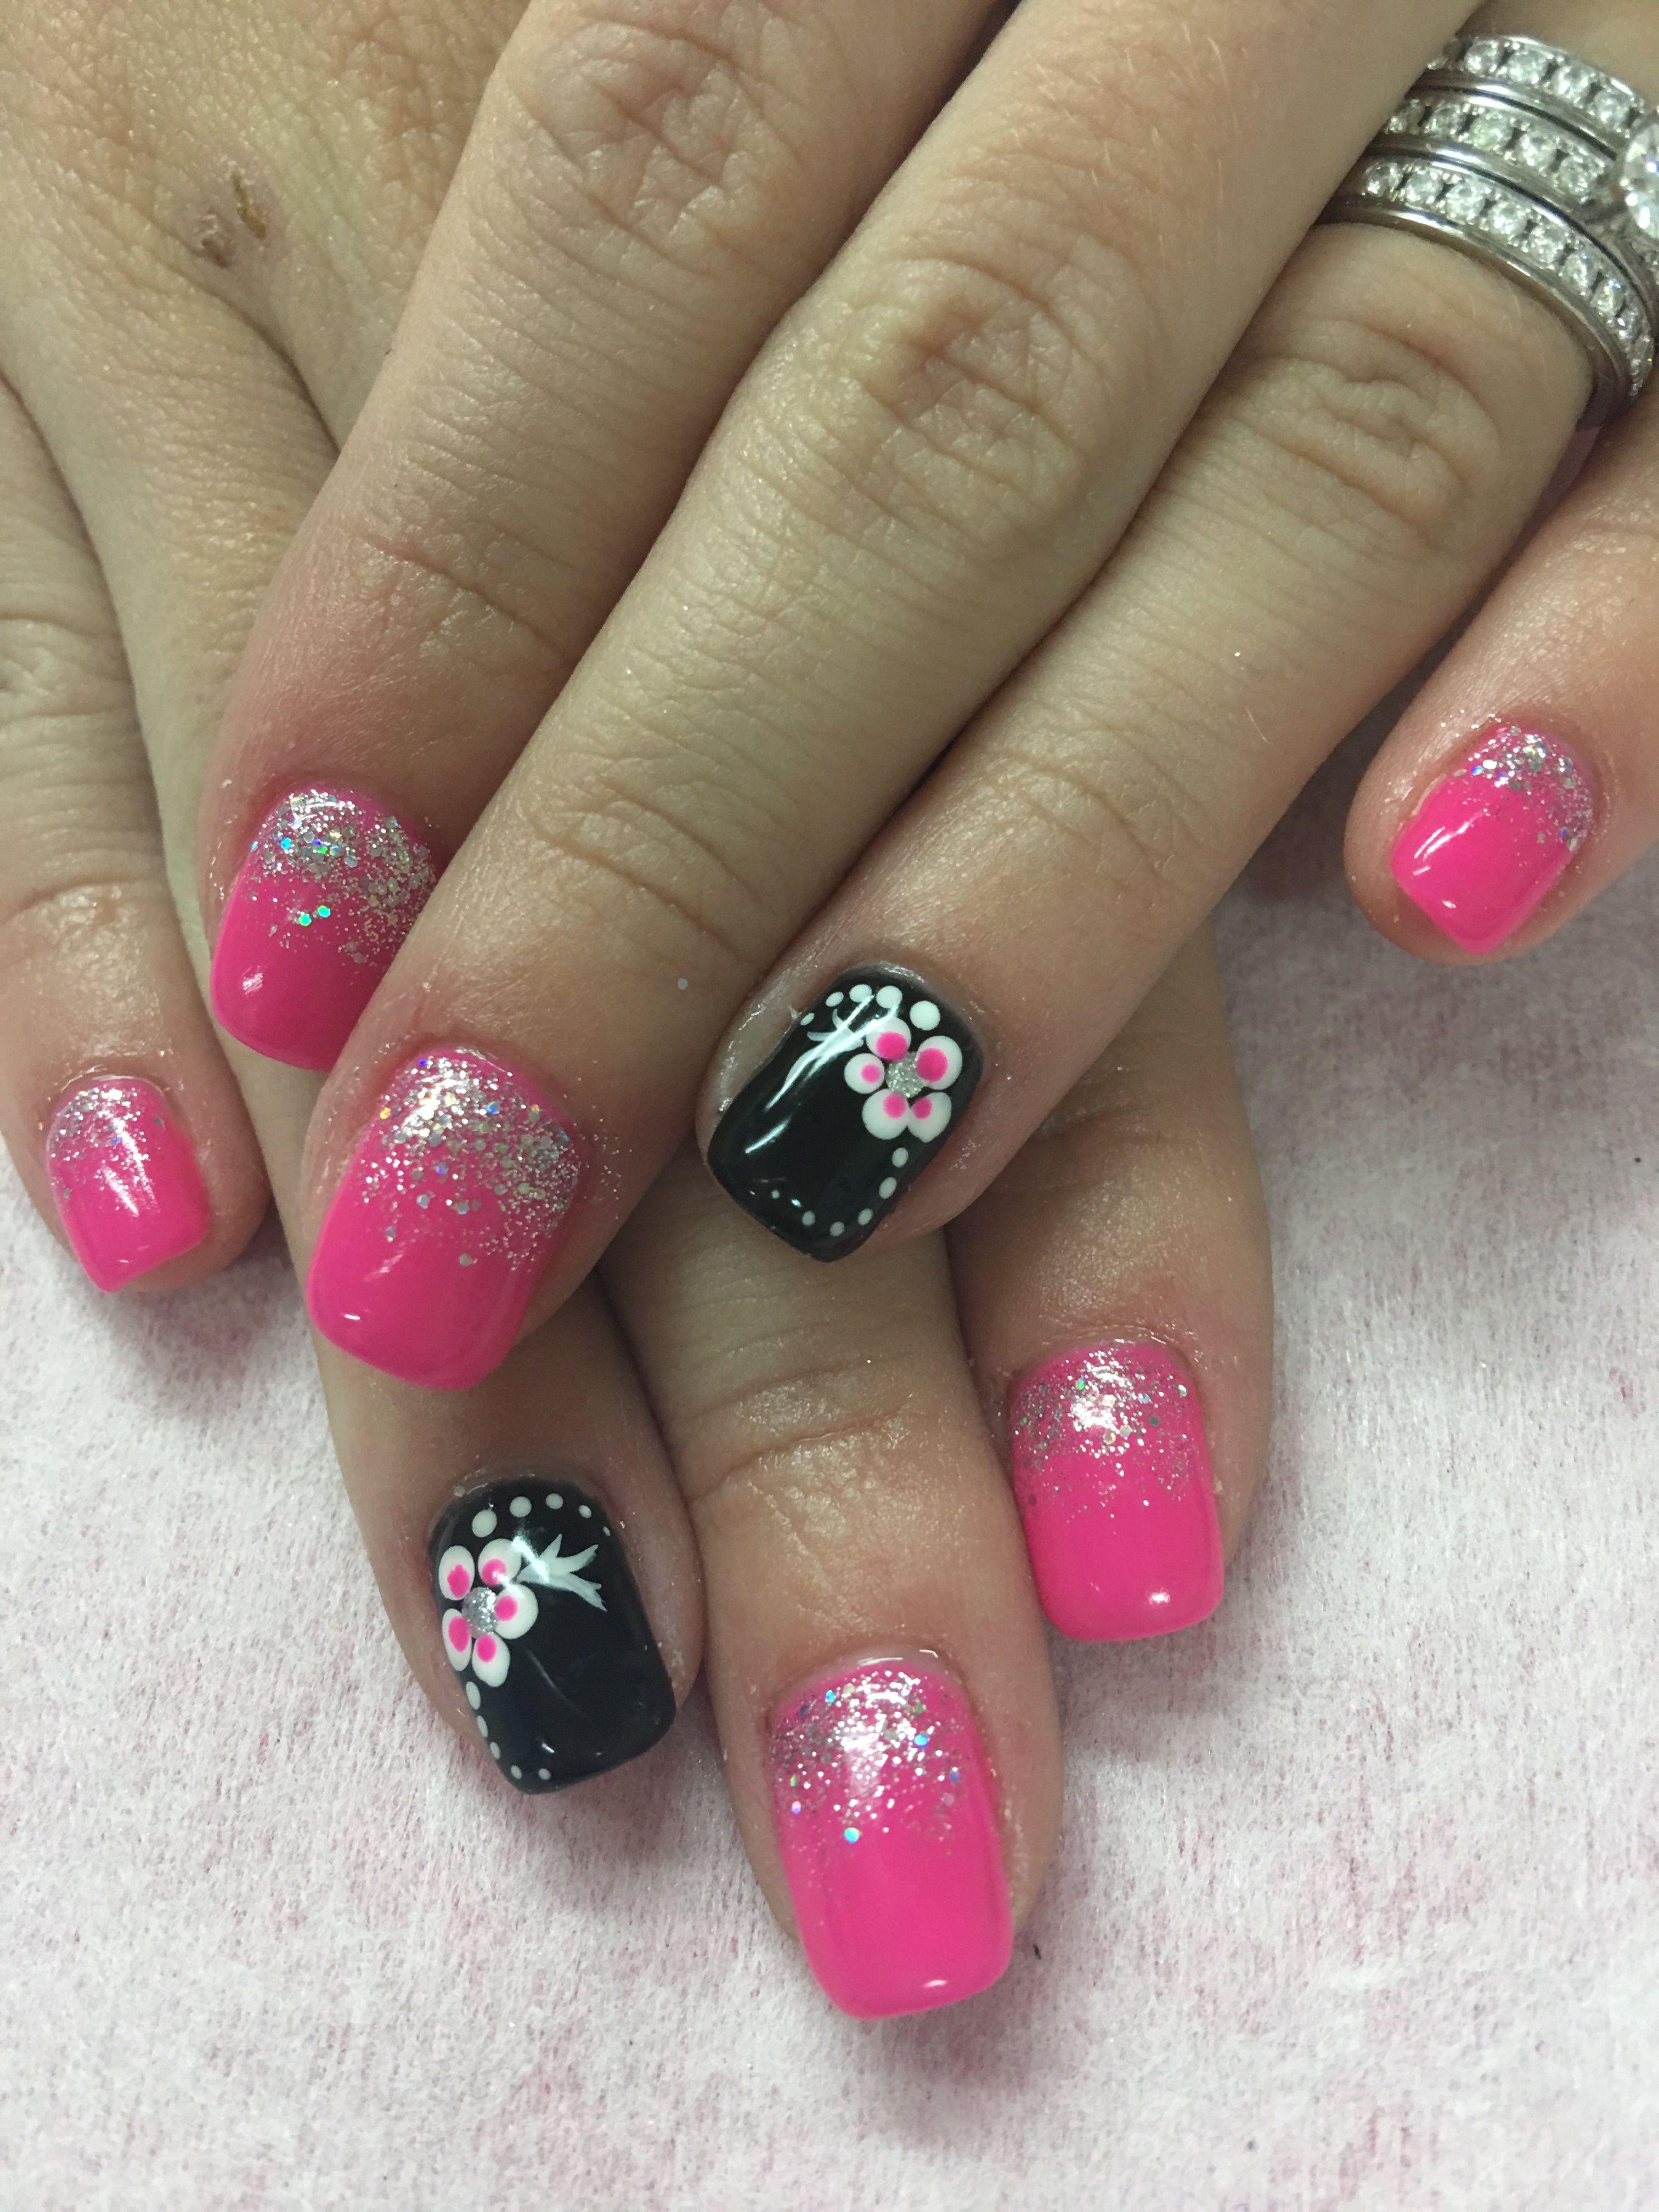 Hot Pink Black Flower Glitter Ombre Gel Nails Ombre Gel Nails Pink Nails Nail Designs Hot Pink